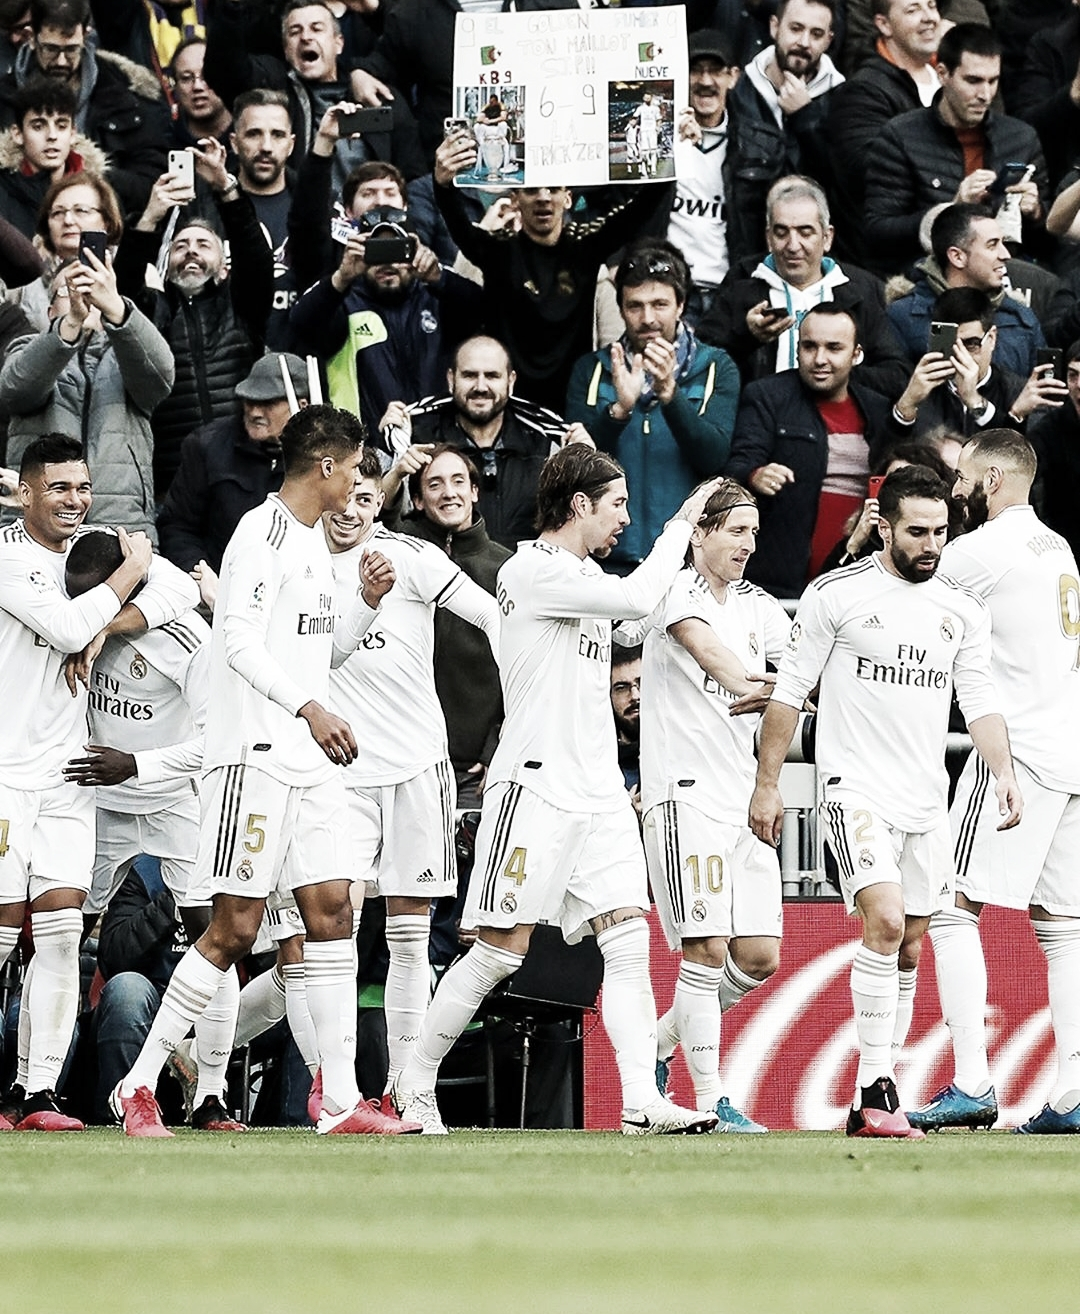 Análisis del Real Madrid, rival del Mallorca: no fallar para ser campeones